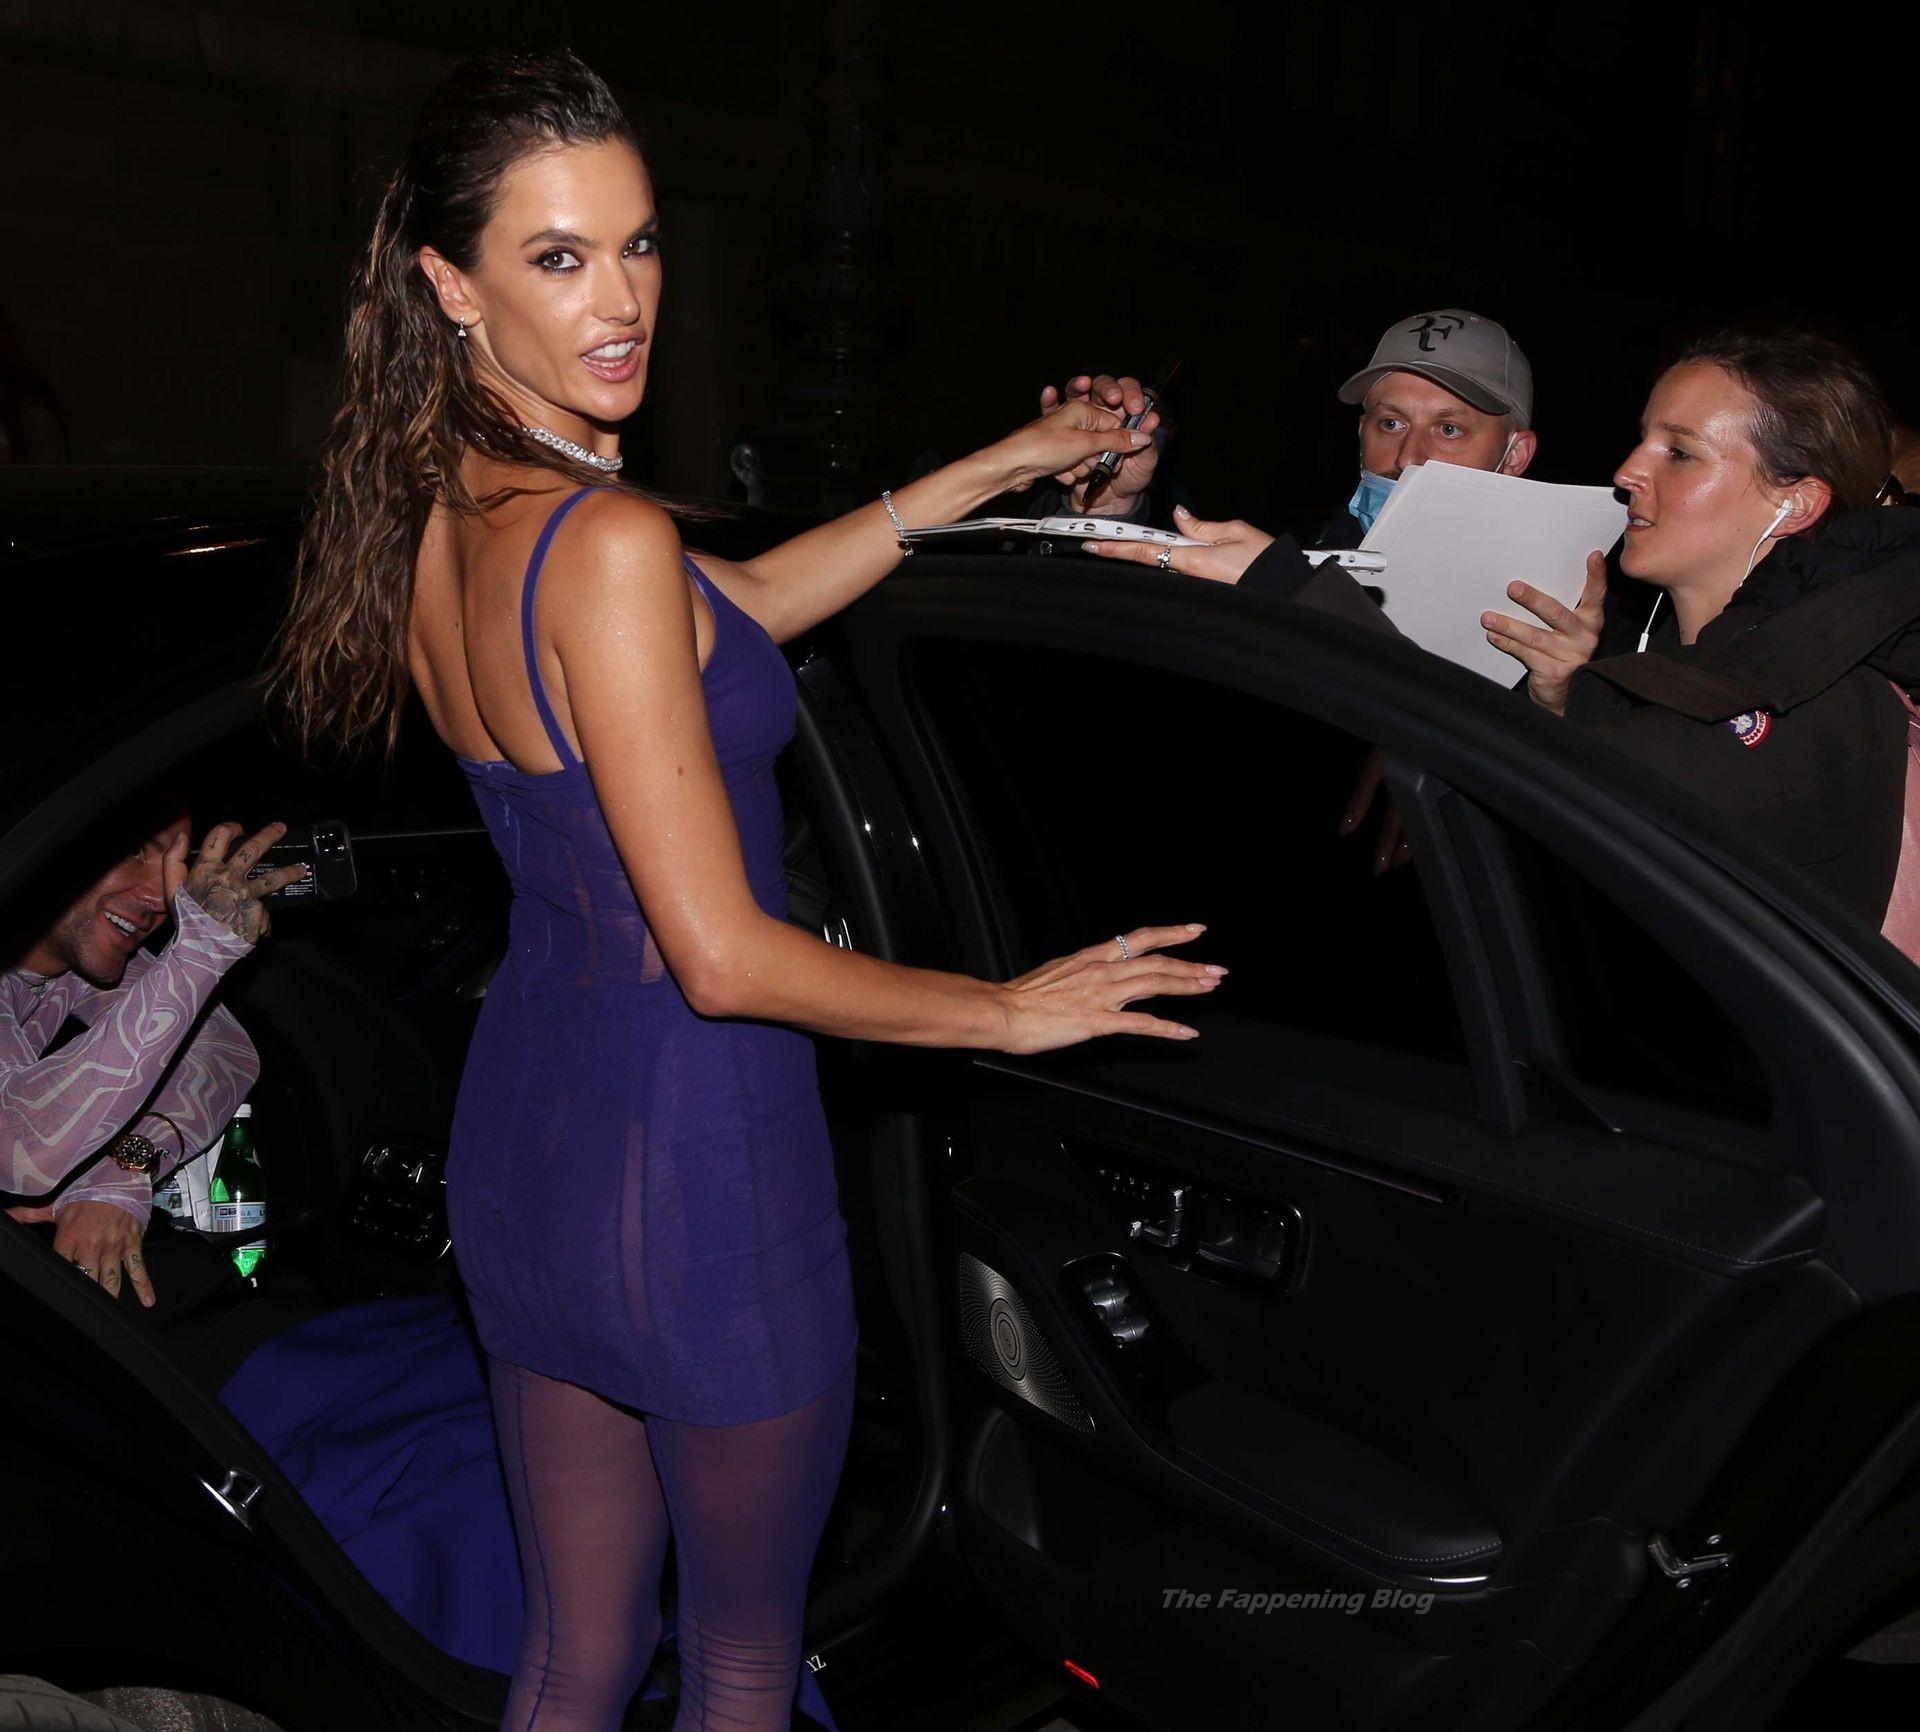 Alessandra-Ambrosio-Sexy-The-Fappening-Blog-68-1.jpg